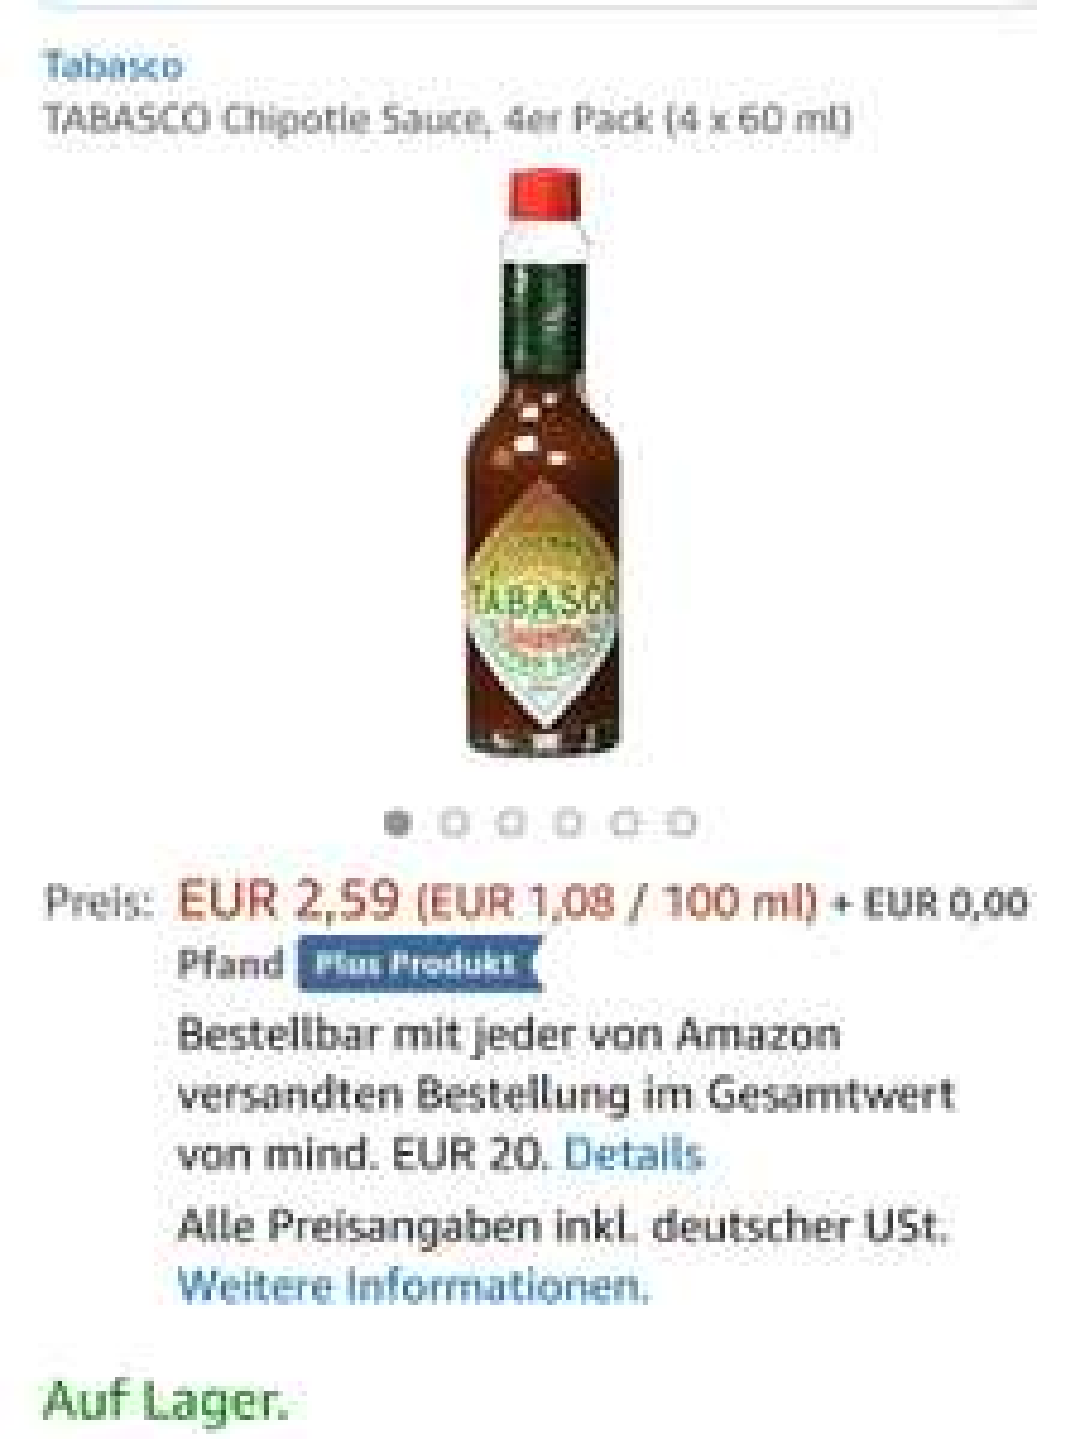 TABASCO Chipotle Sauce, 4er Pack (4 x 60 ml) Amazon Plus Produkt